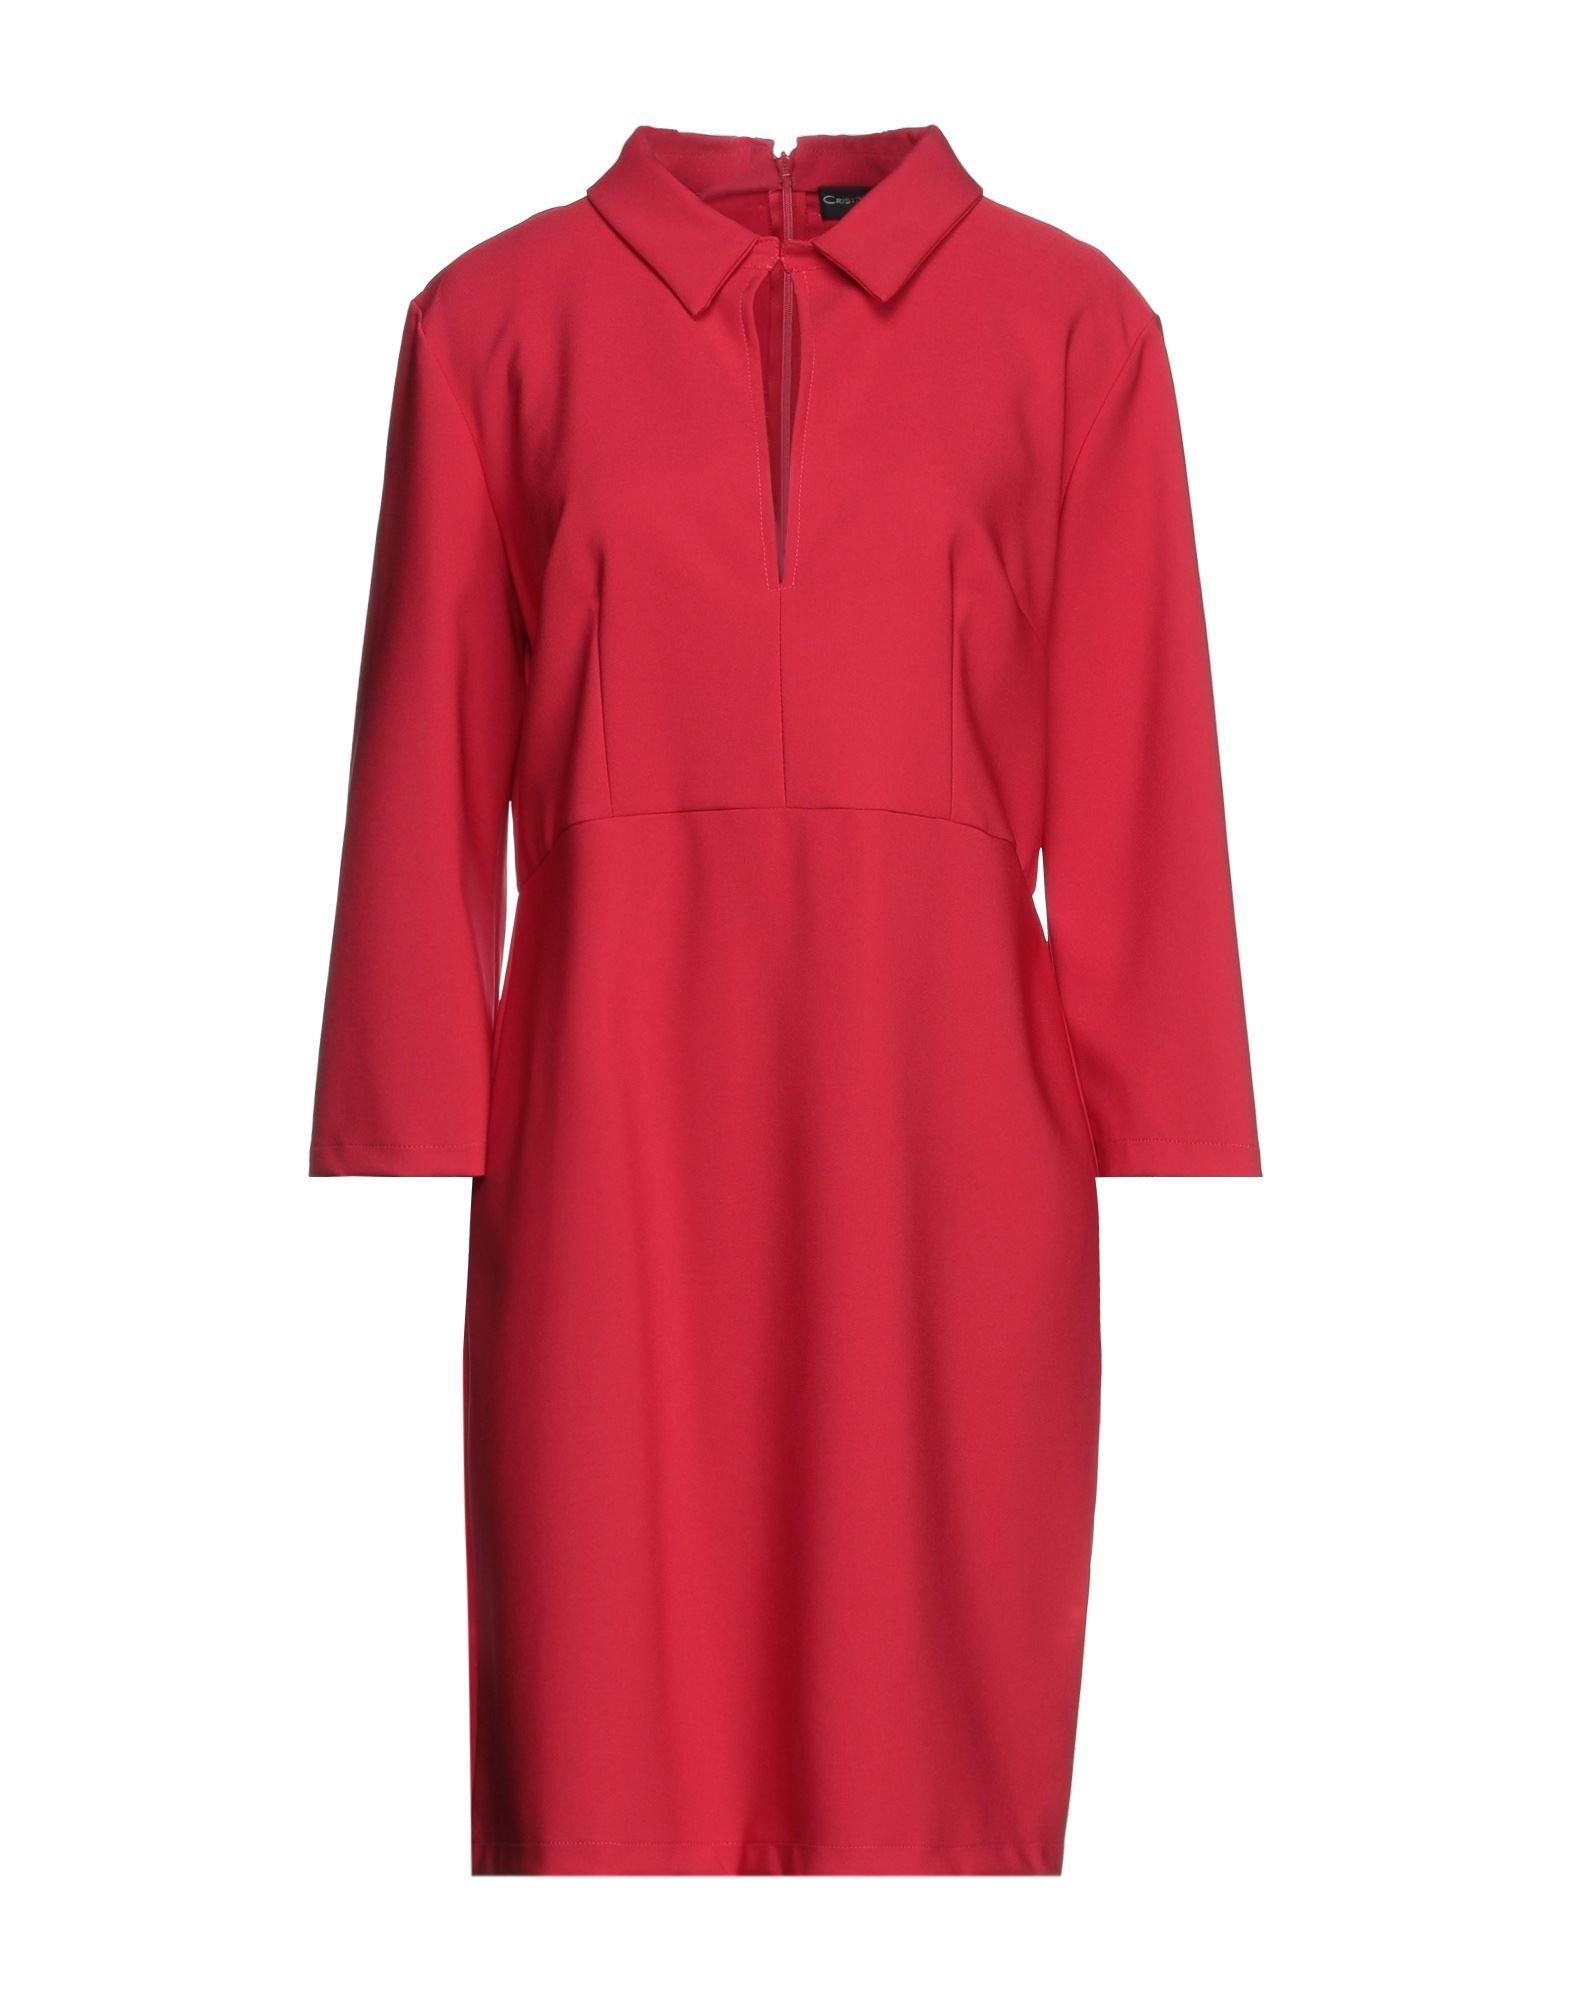 cristina gavioli collection длинное платье CRISTINA GAVIOLI Короткое платье